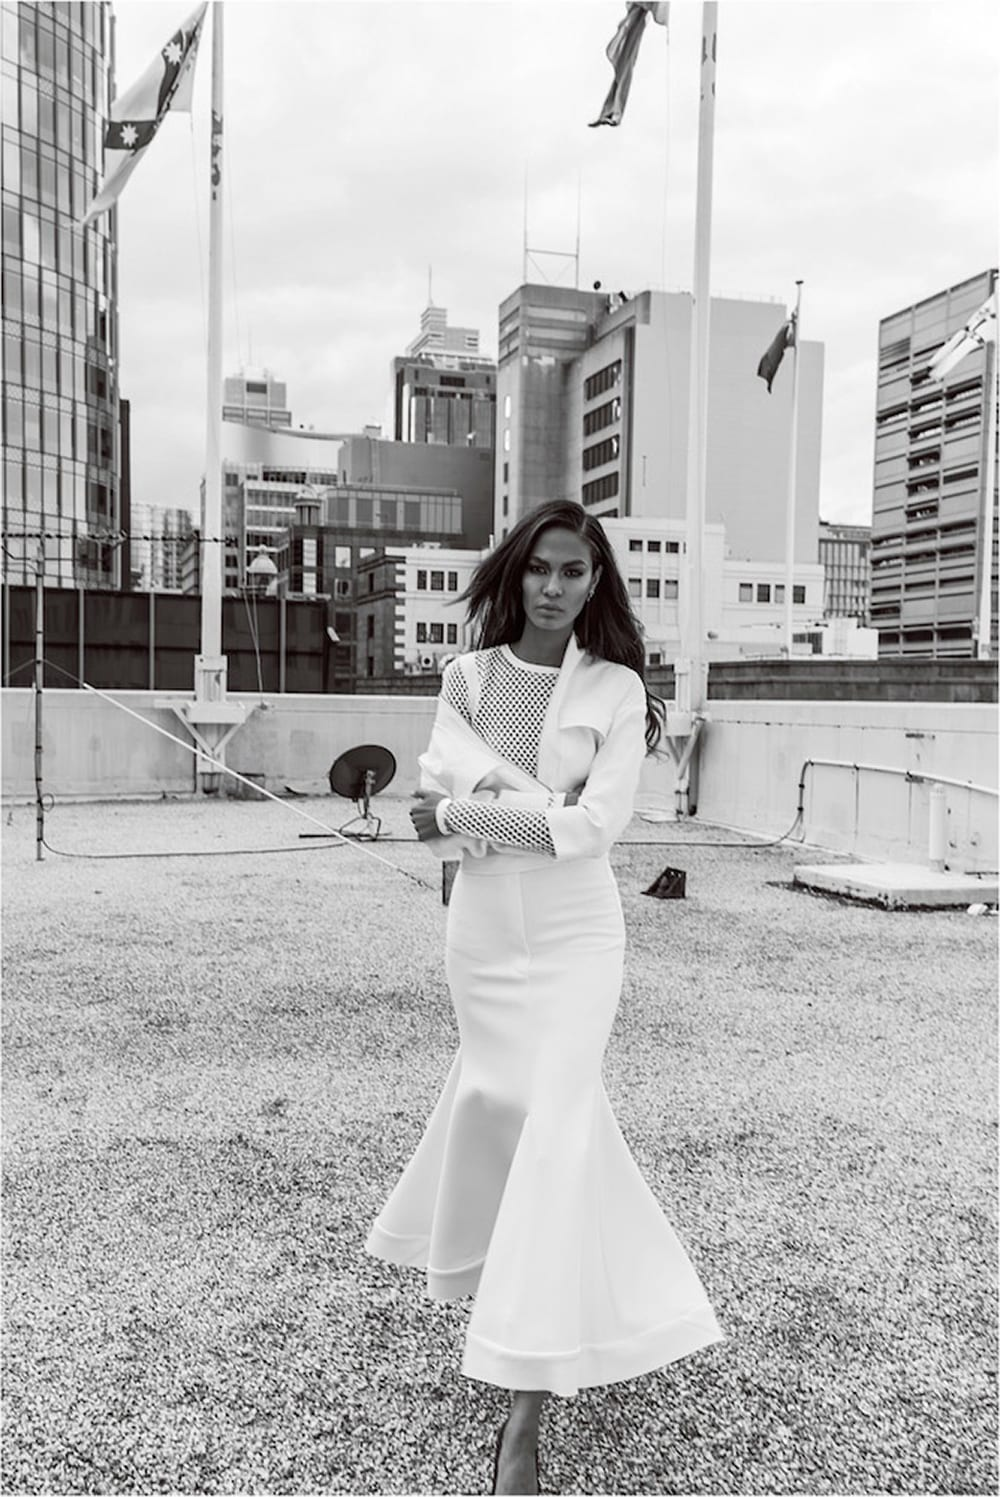 StyleAndMinimalism | Editorials | Joan Smalls Photographed By Margaret Zhang for Davis Jones' Studio W